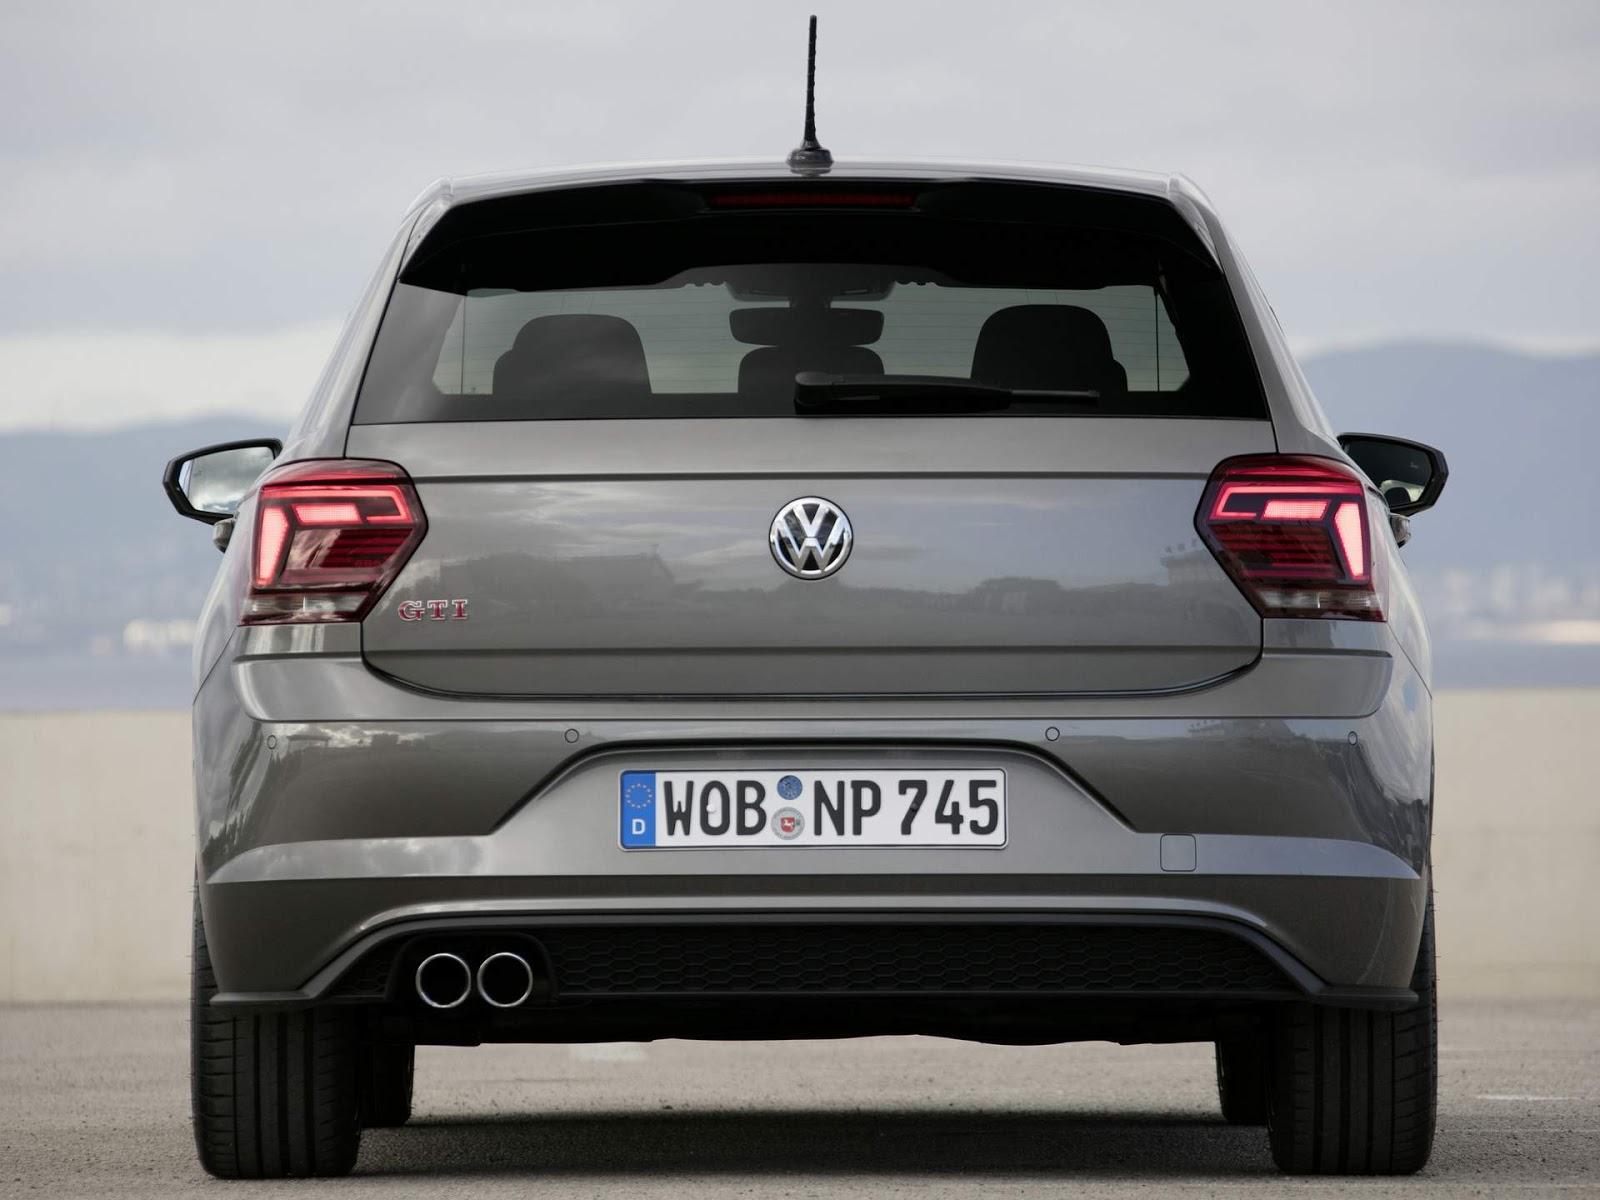 VW confirma Polo e Virtus GTS com motor 1.4 TSI - Brasil  a3b69418579